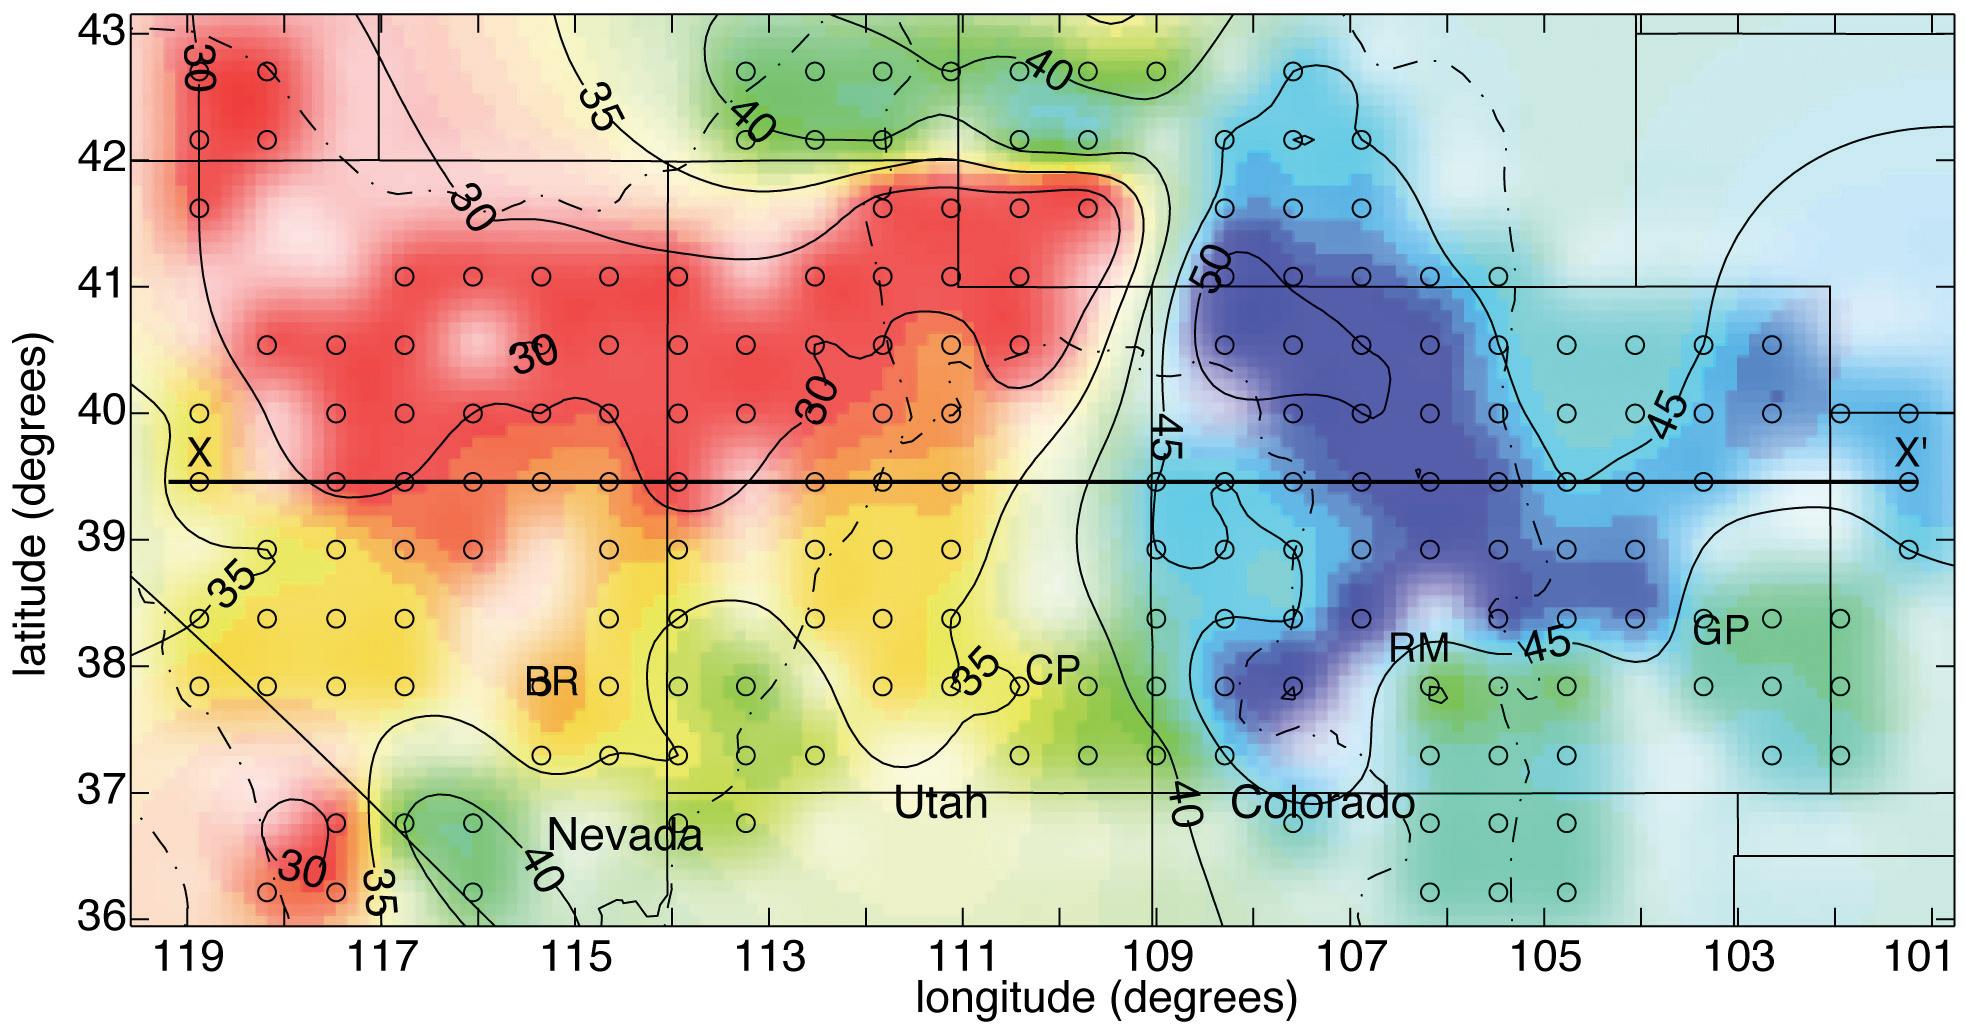 Crustal Structure Of The Basin And Range Colorado Plateau Rocky - Map of colorado plateau region